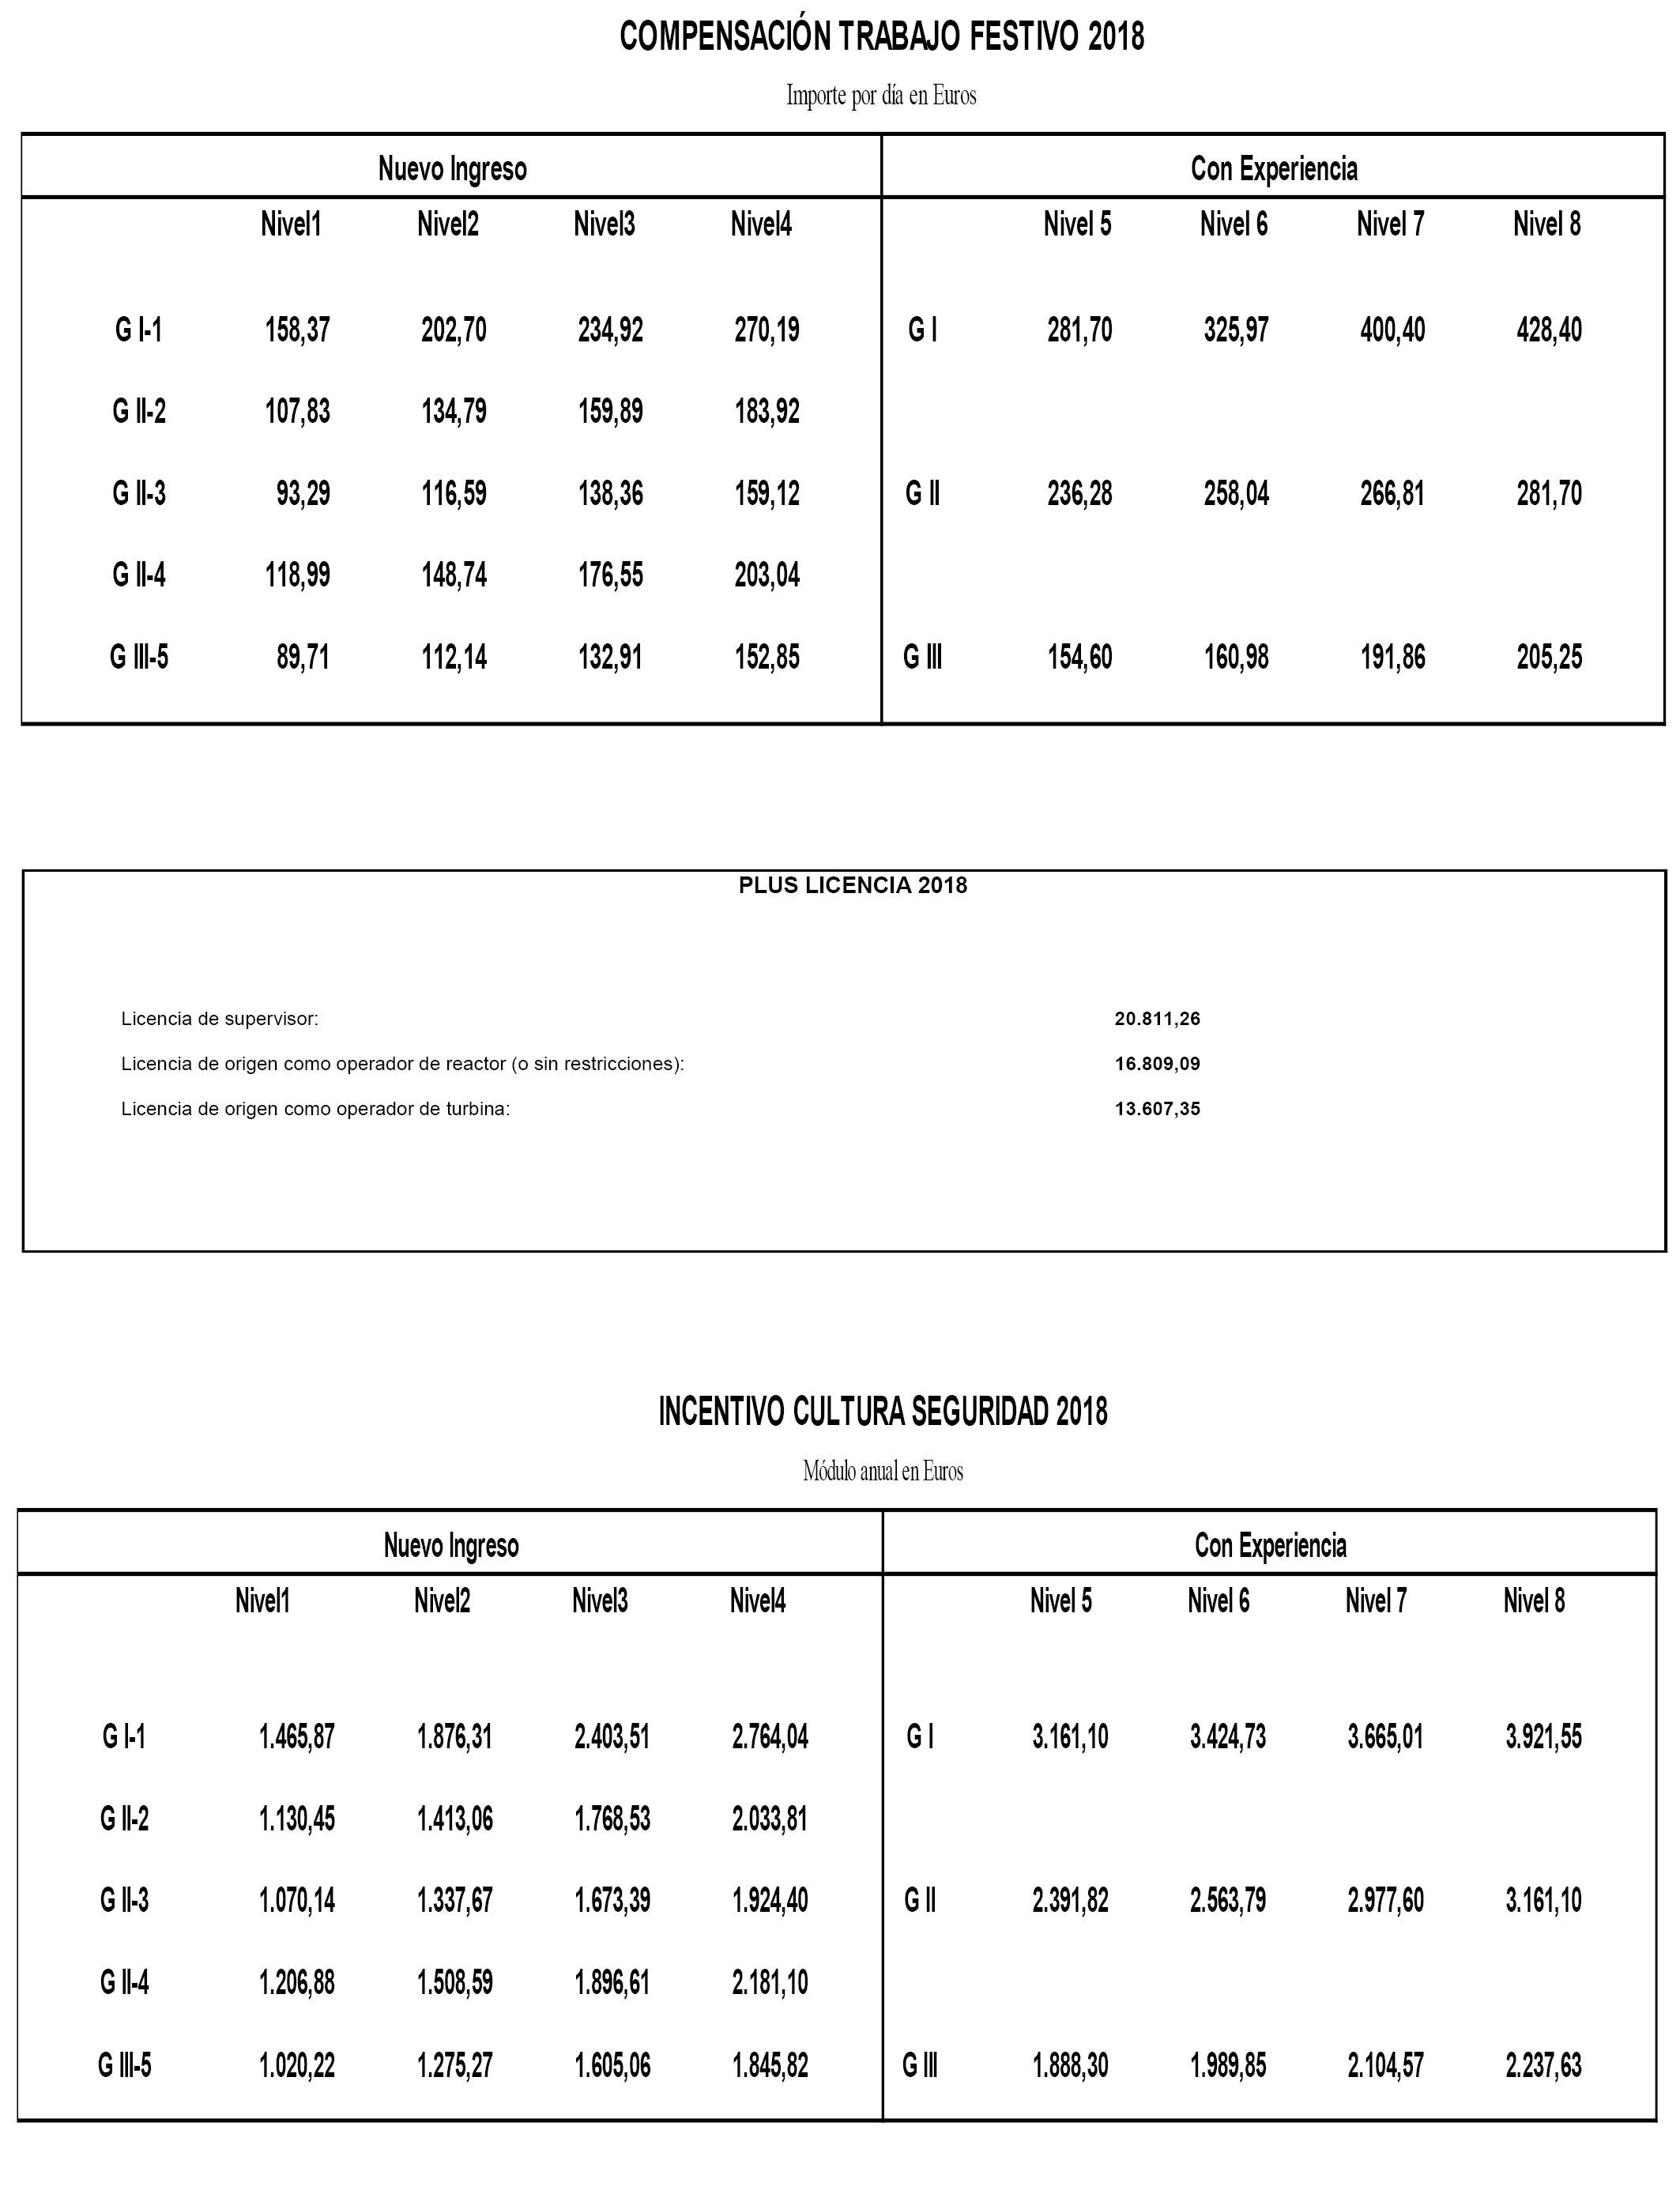 BOE.es - Documento BOE-A-2018-1398